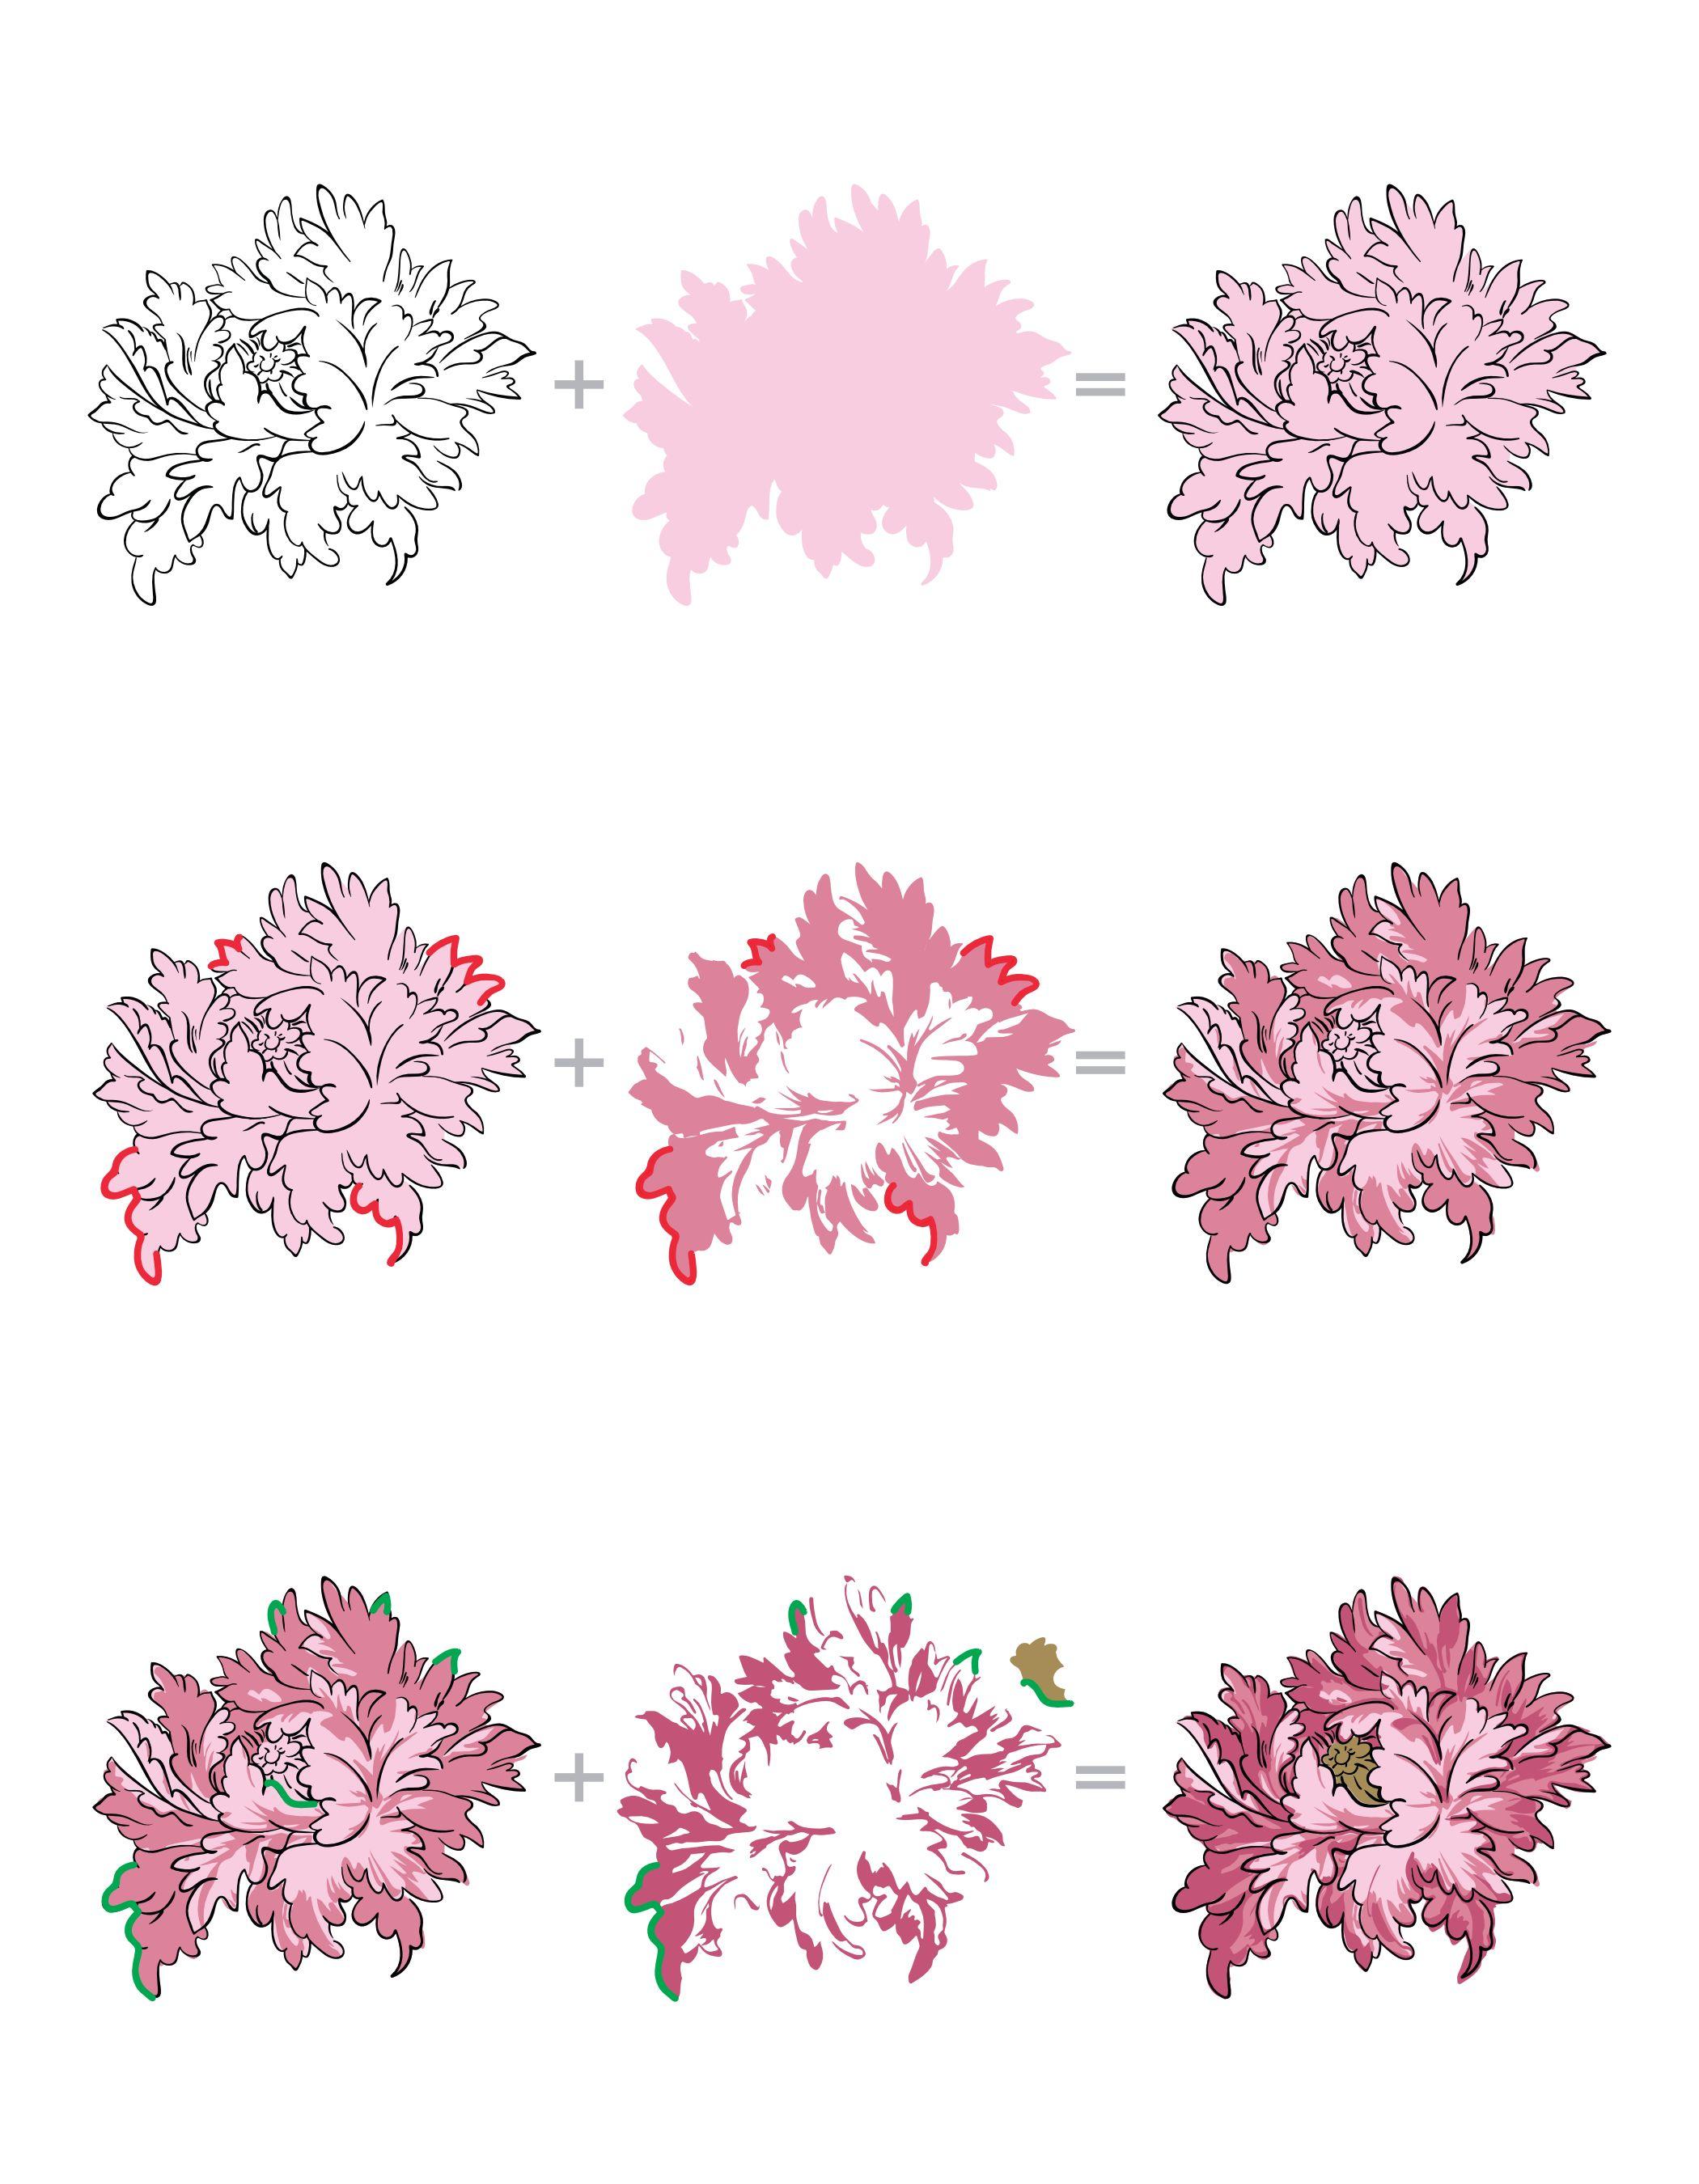 http://altenewblog.com/wp-content/uploads/2016/09/Majestic-Bloom-Guide.jpg